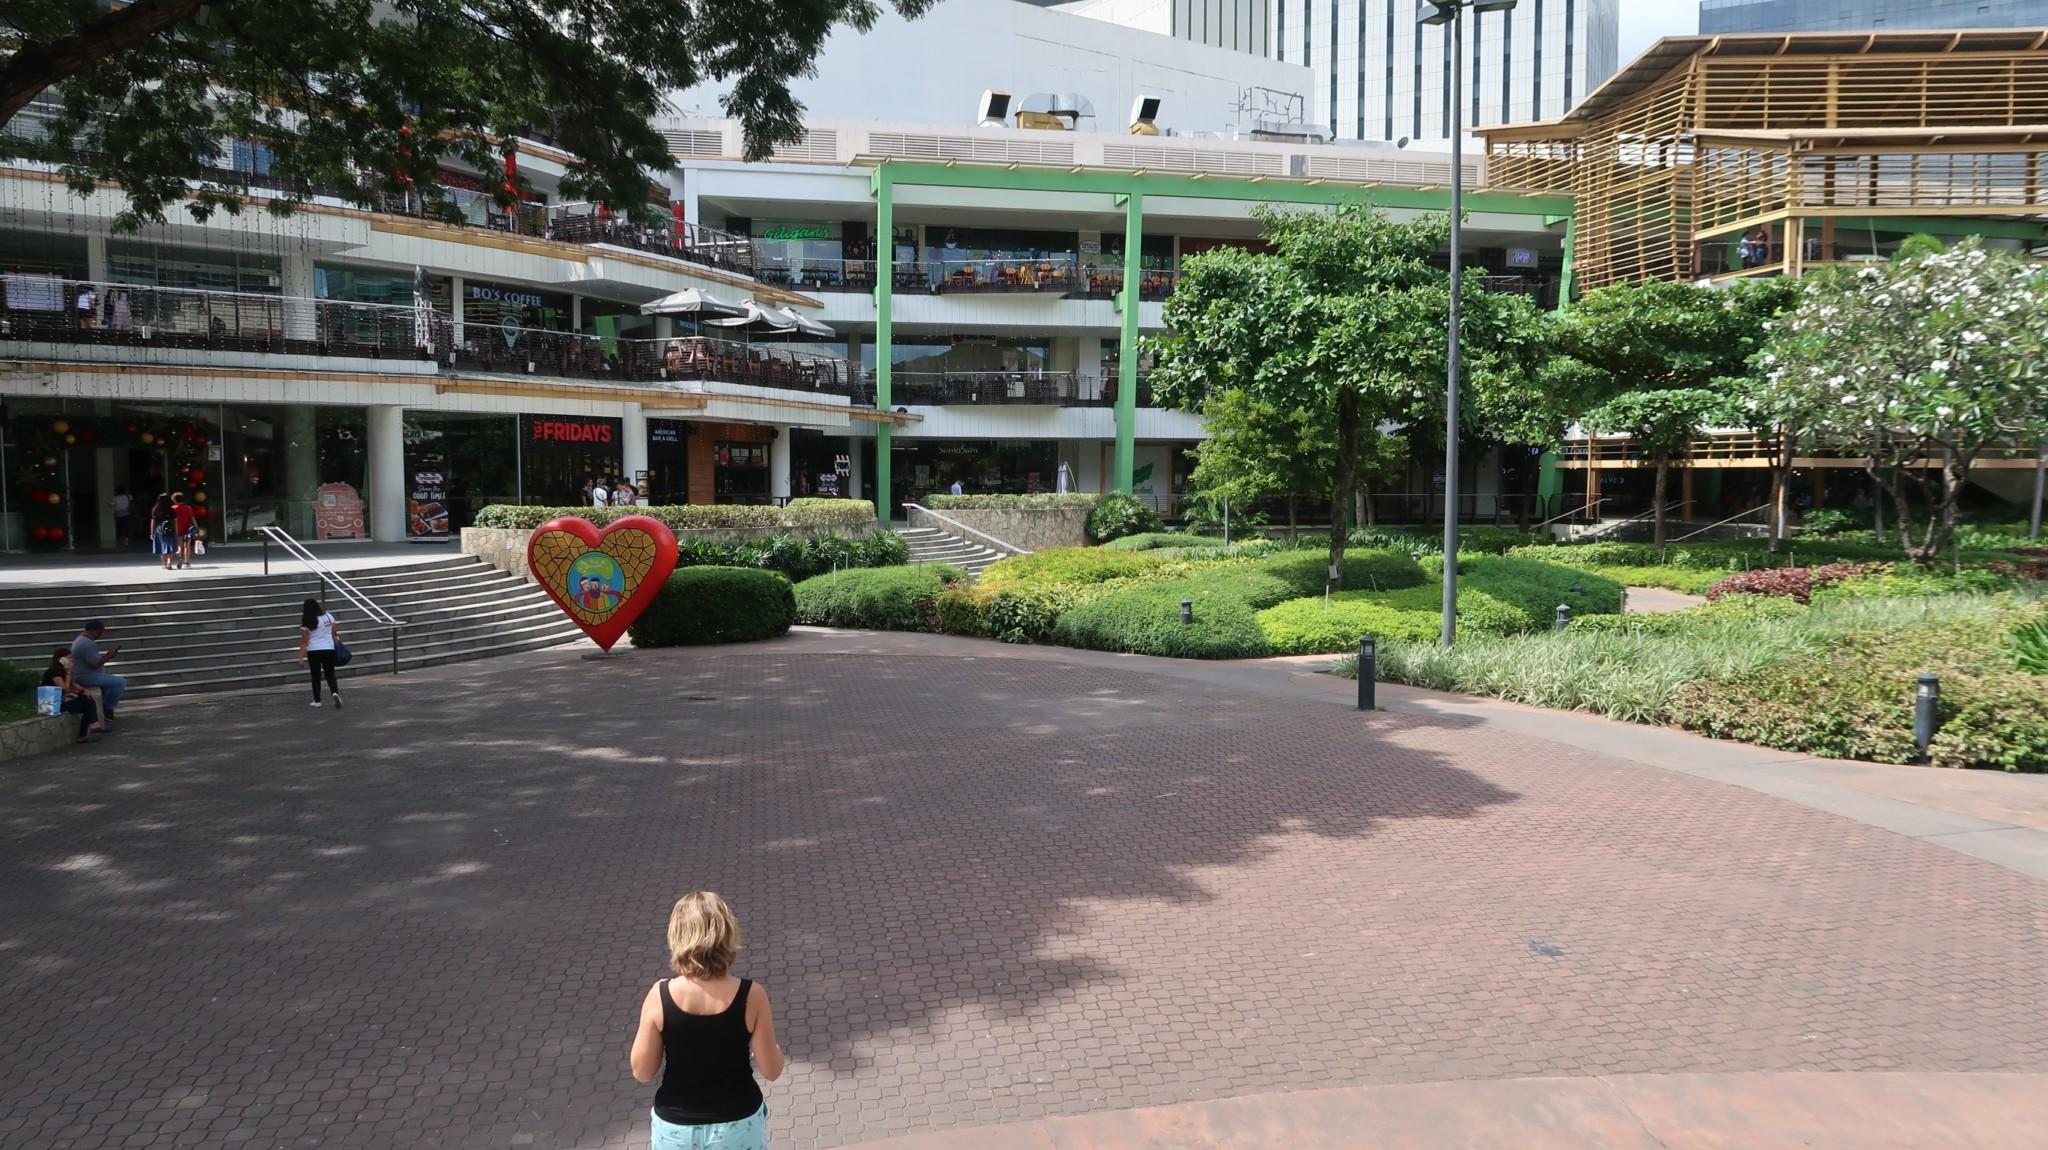 Ayala Shopping Center Cebu